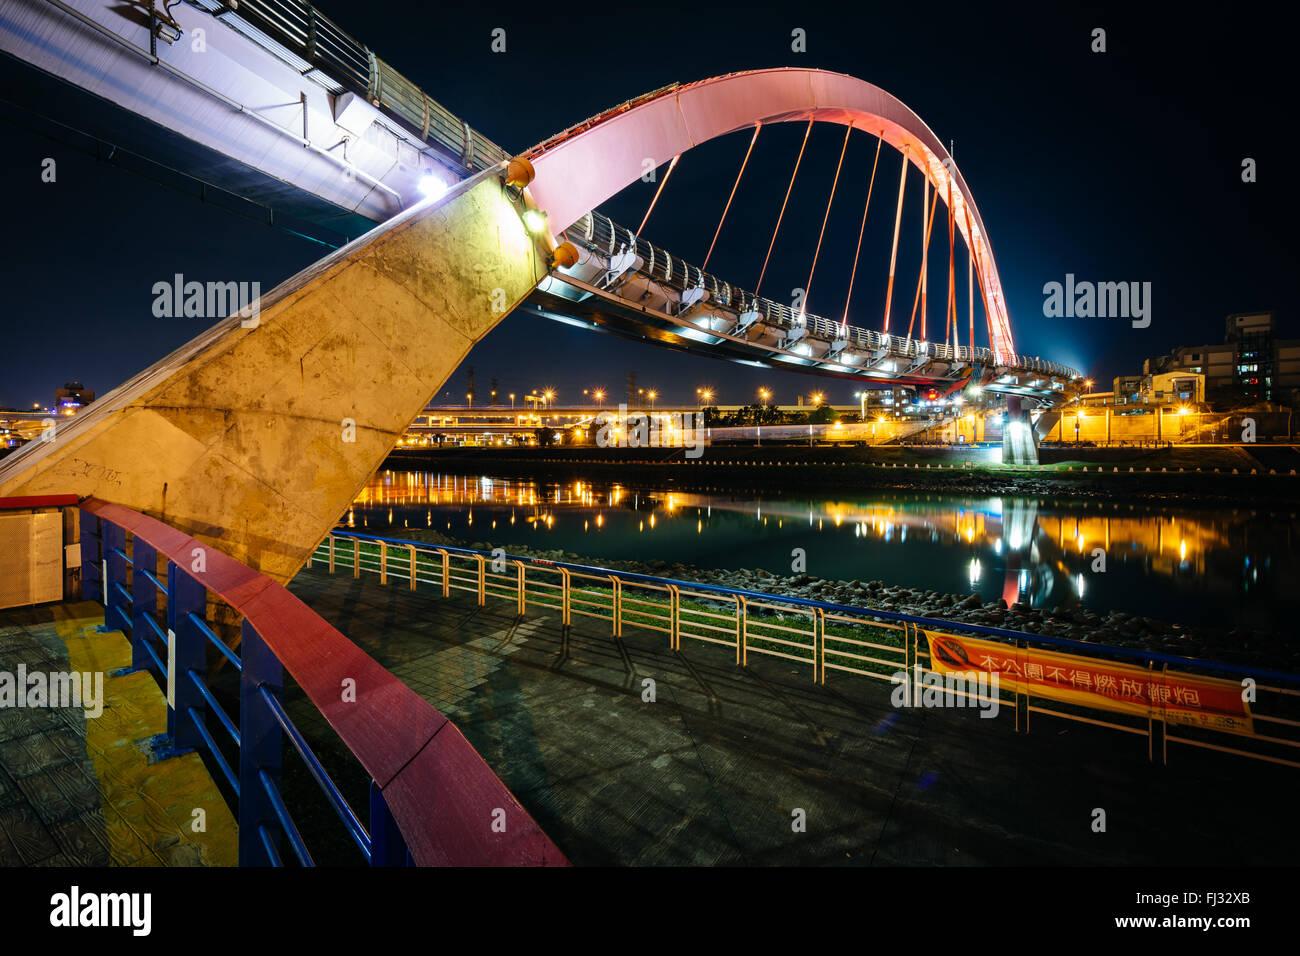 The Rainbow Bridge at night, in Taipei, Taiwan. - Stock Image